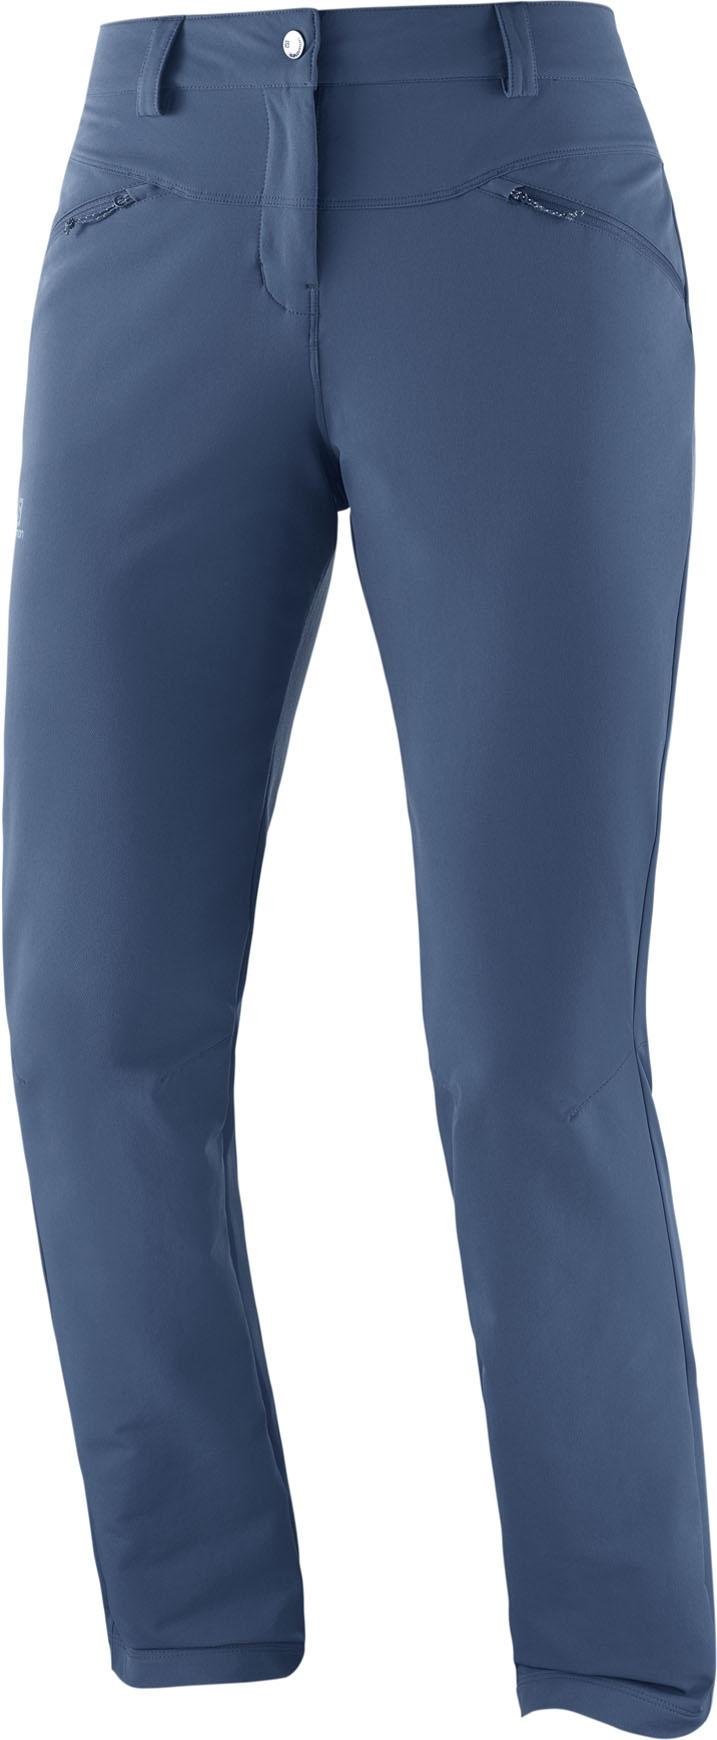 Trekking Trousers Size 38 Womens Wayfarer As Straight Trousers Regular Blue Salomon